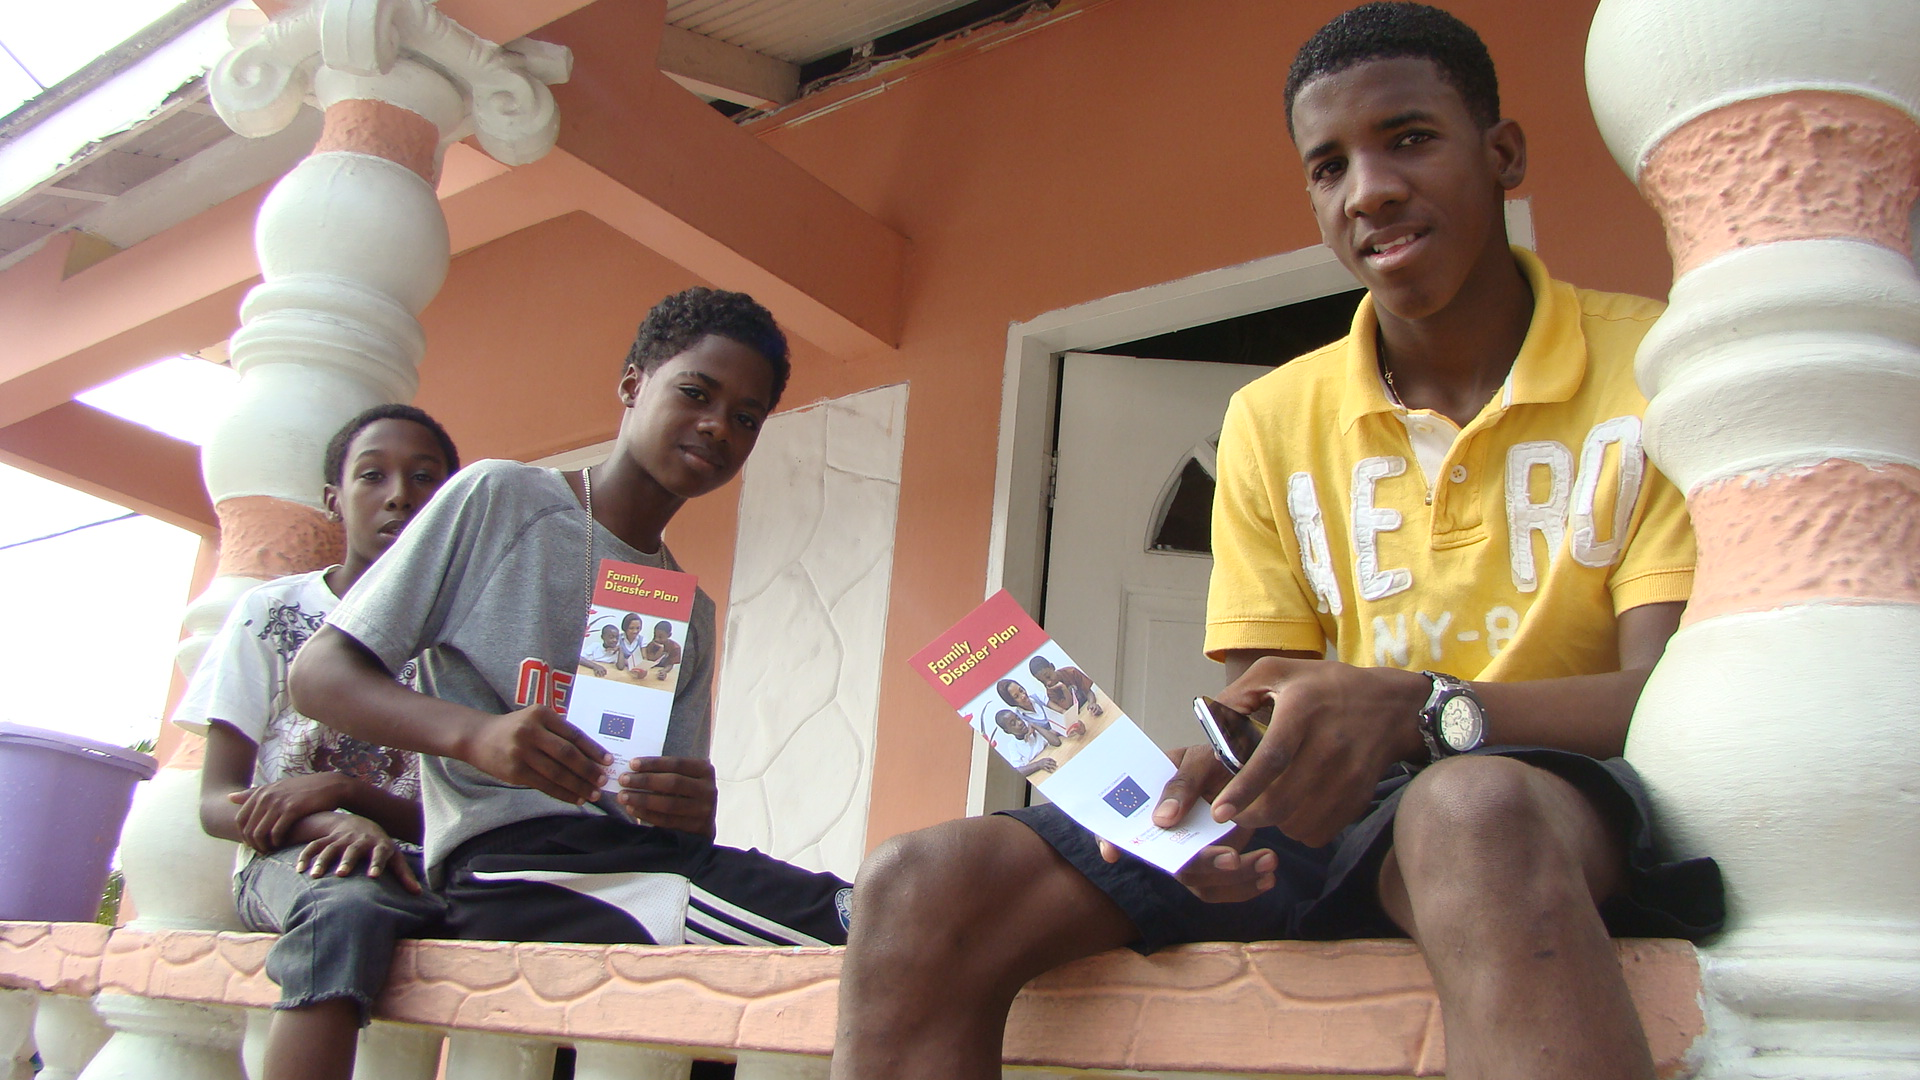 TT Red Cross - ODOE 2011 - DipECHO 8 Community Visit 3